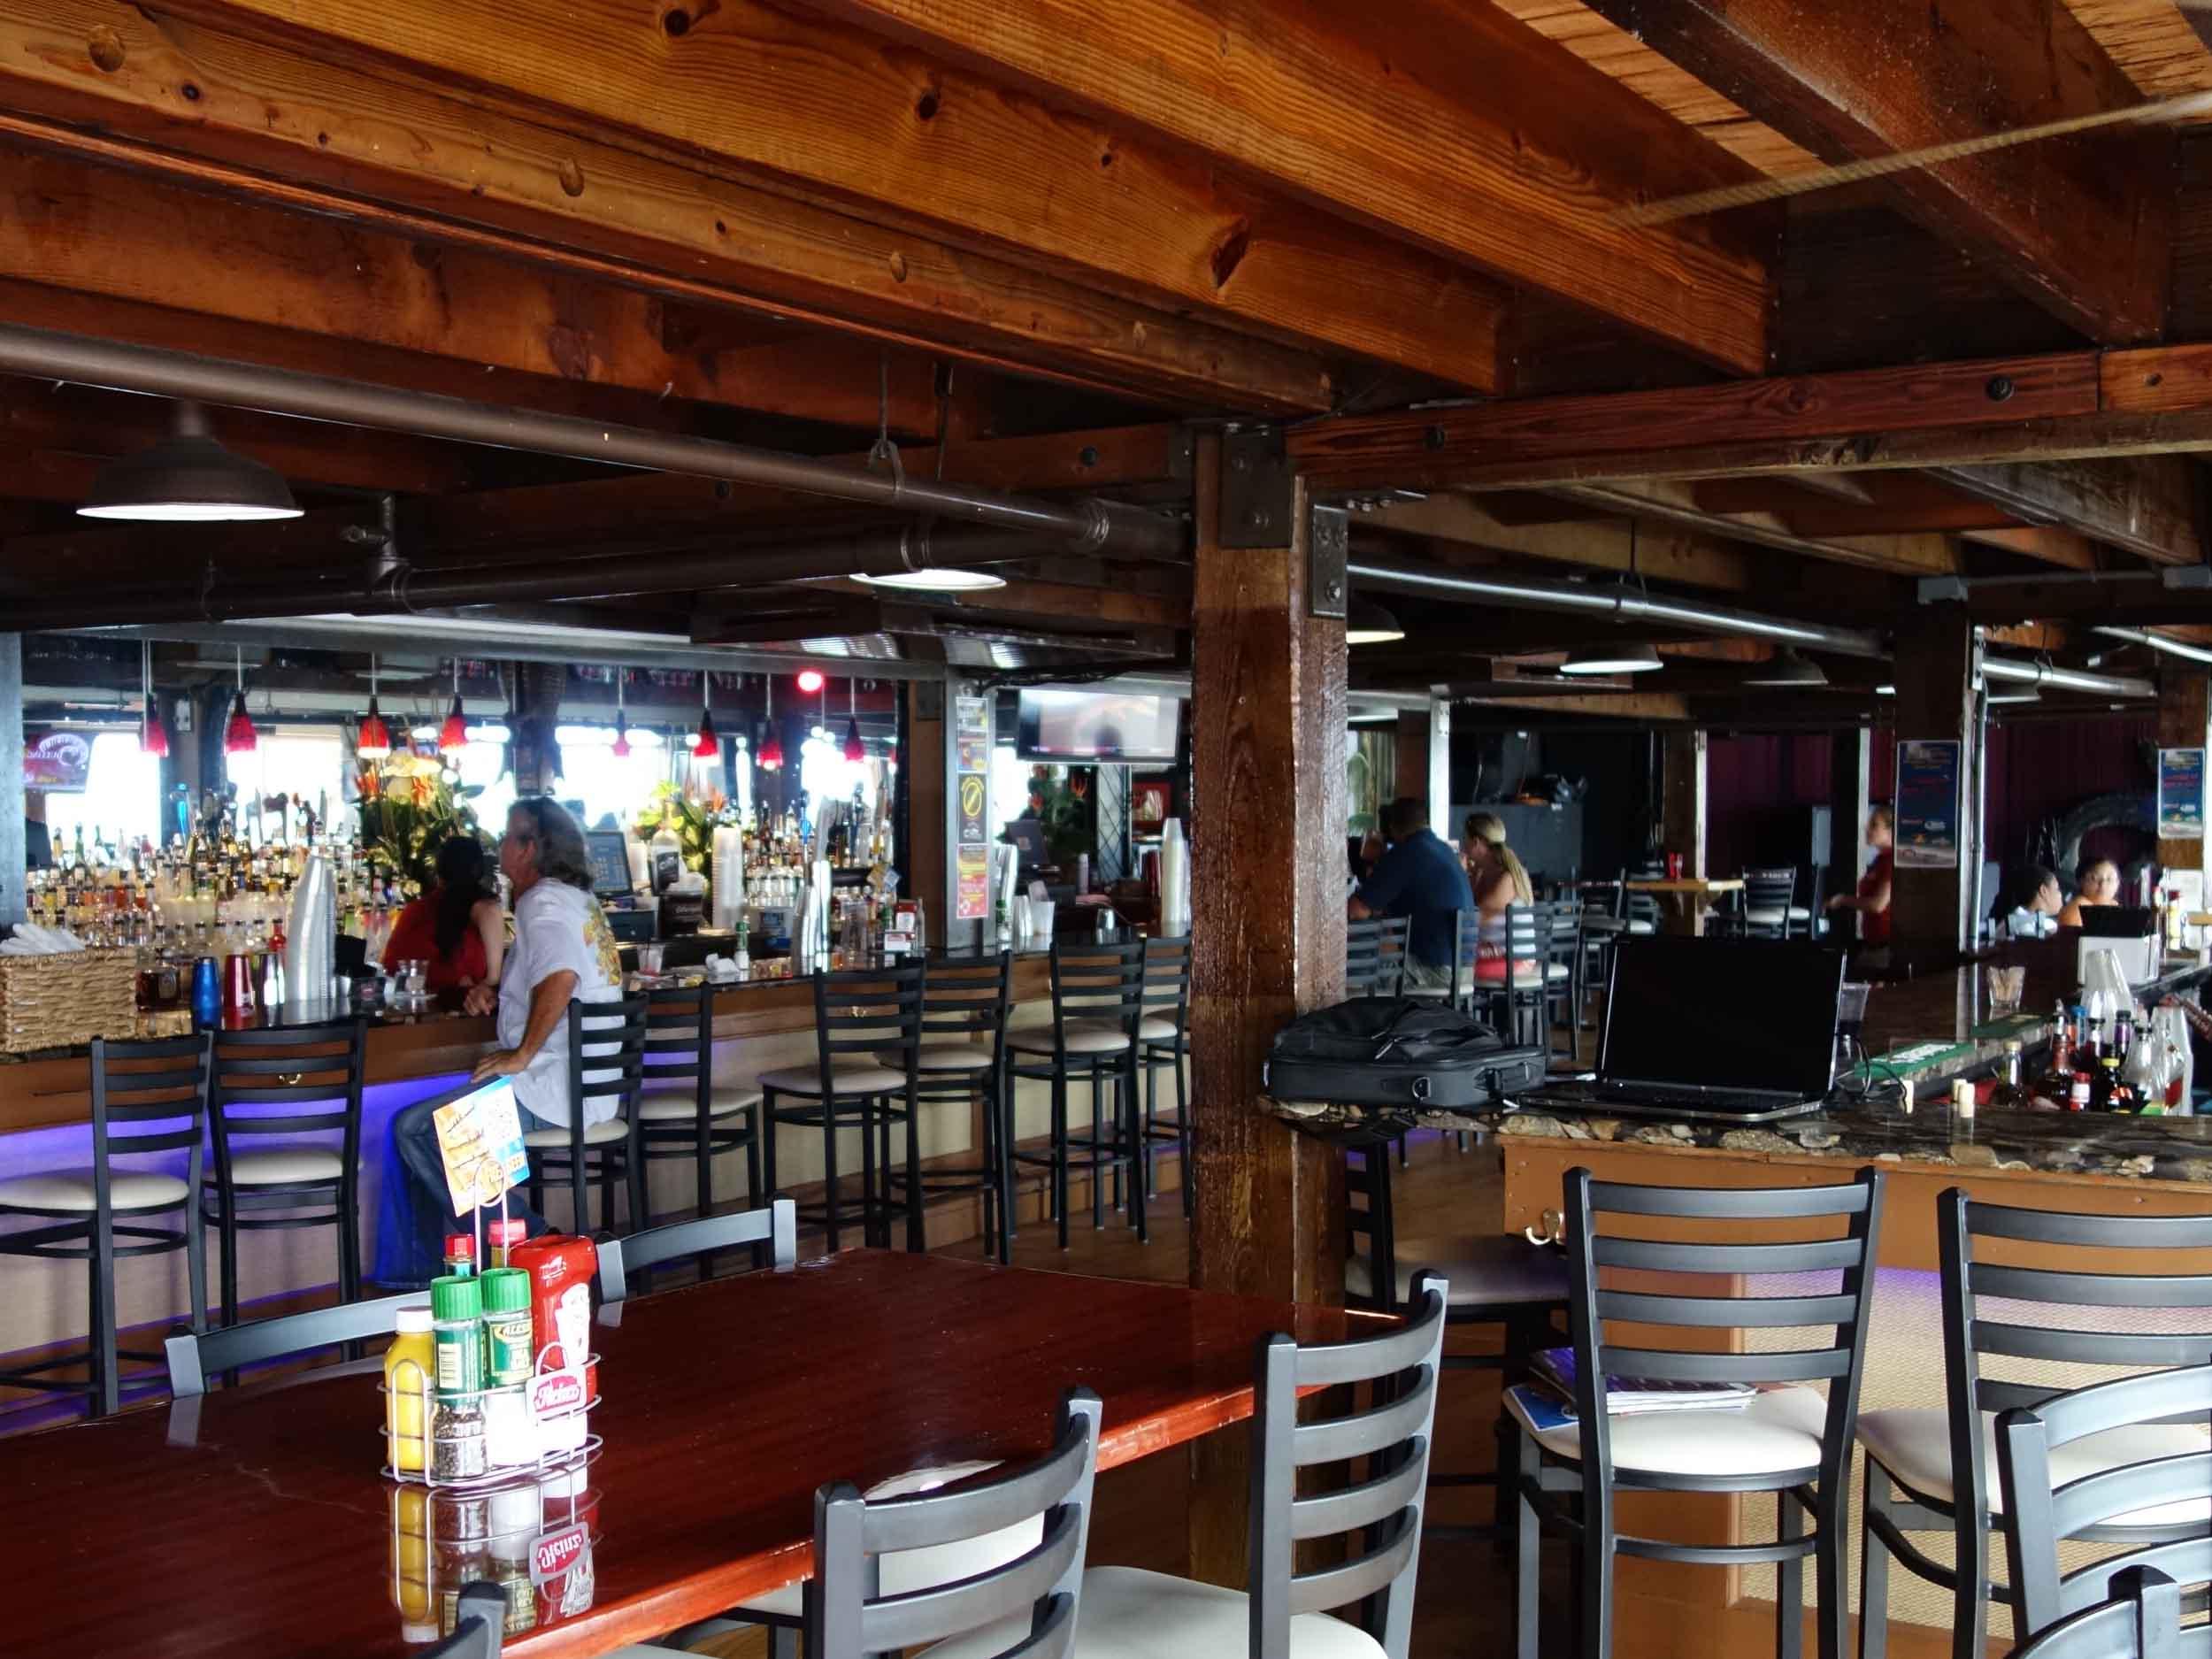 Gator's Cafe and Saloon Inside Bar